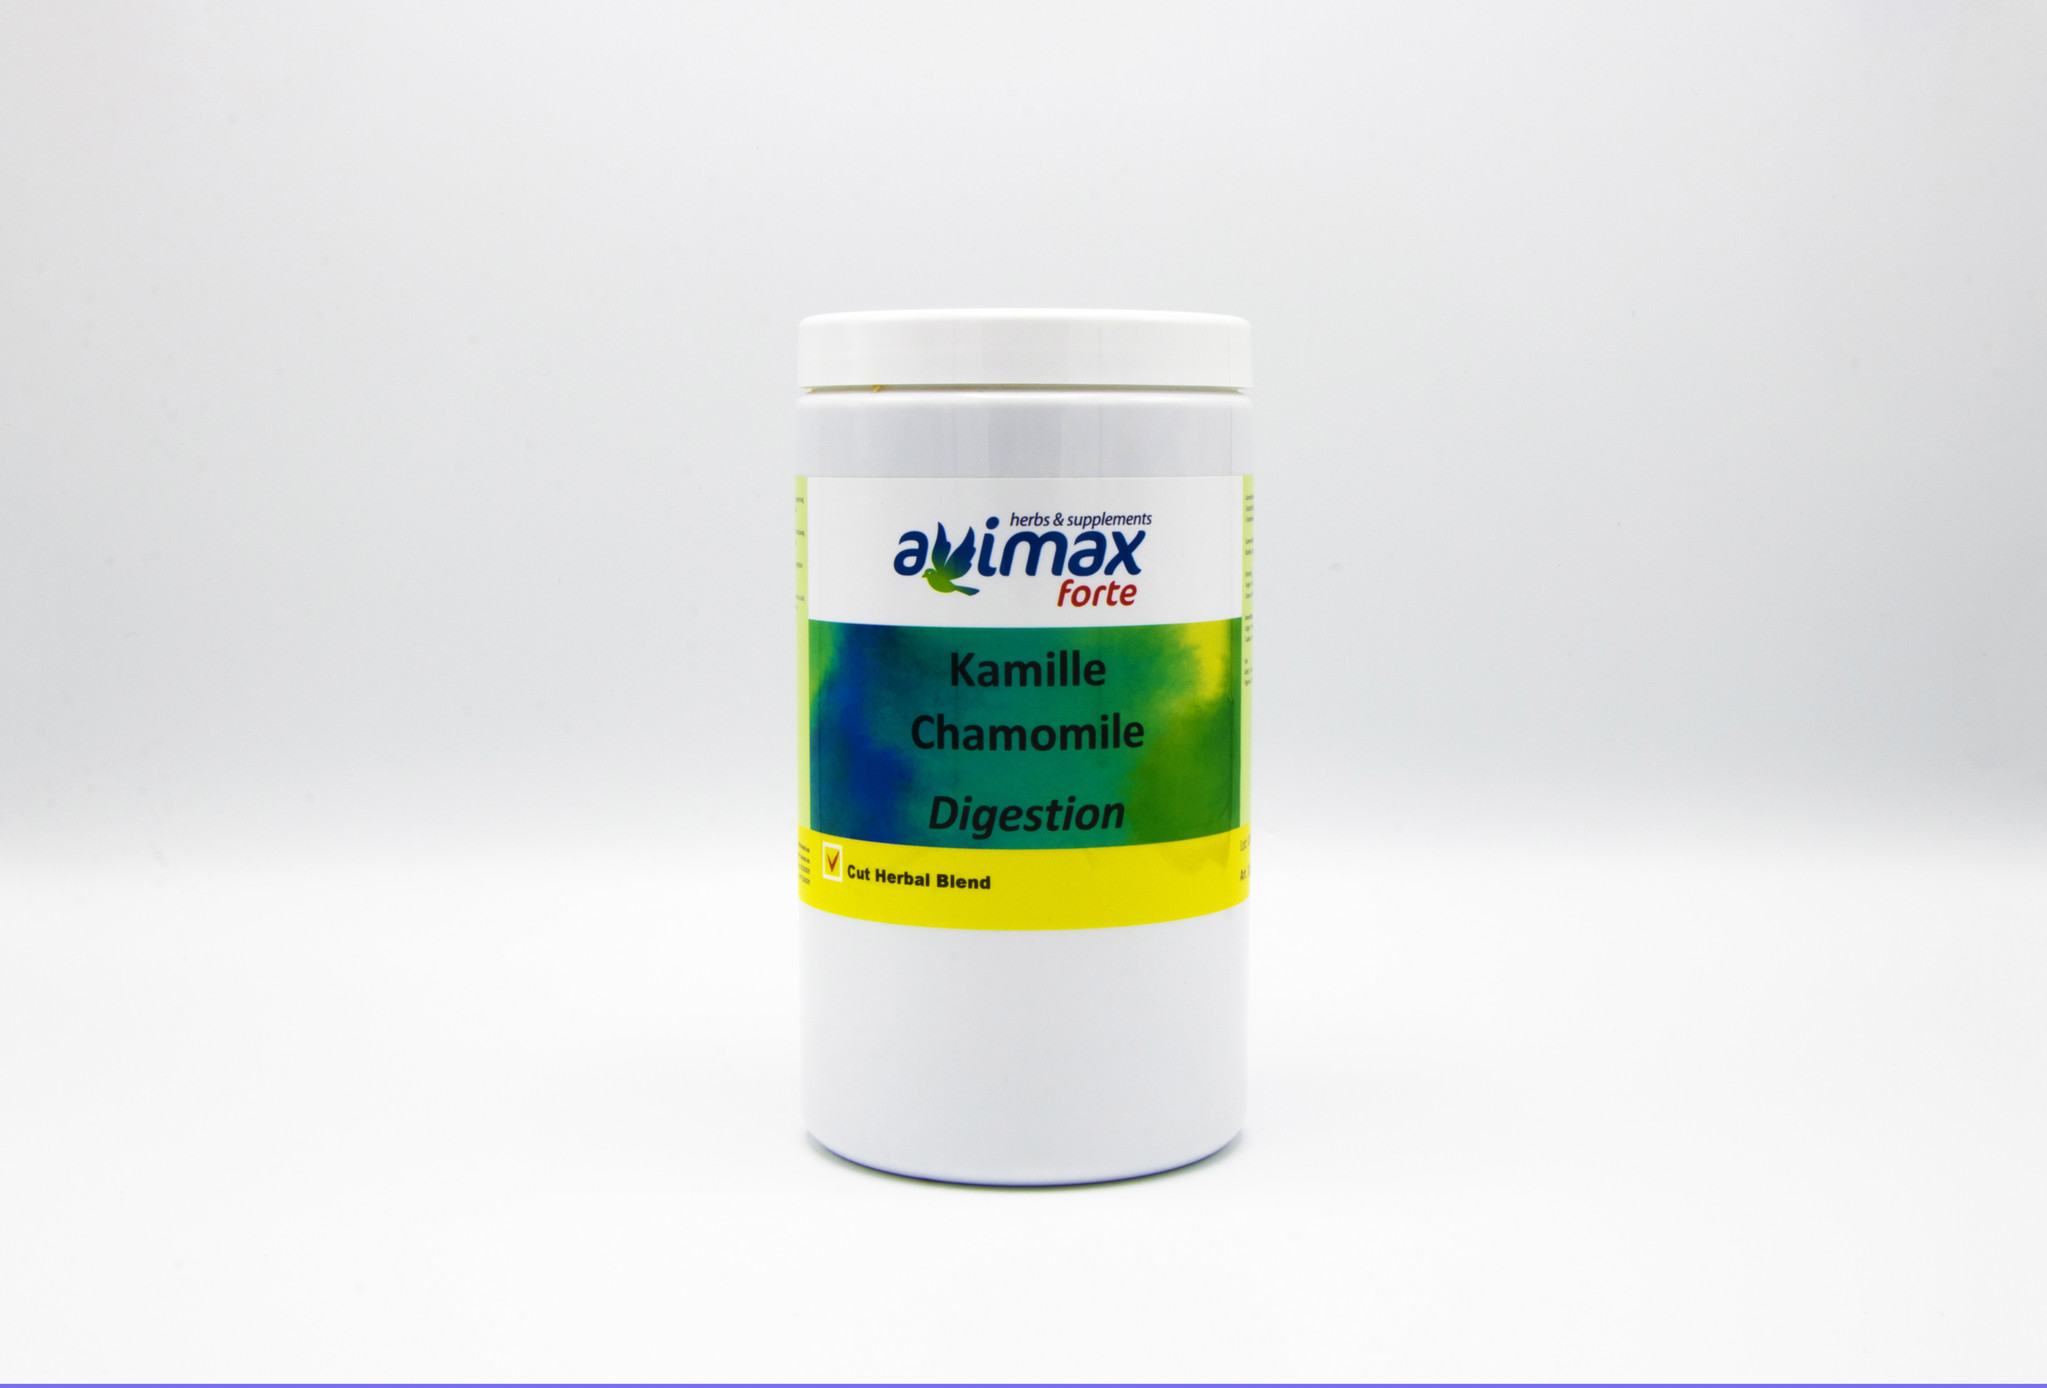 AviMax Forte AviMax Forte Chamomile